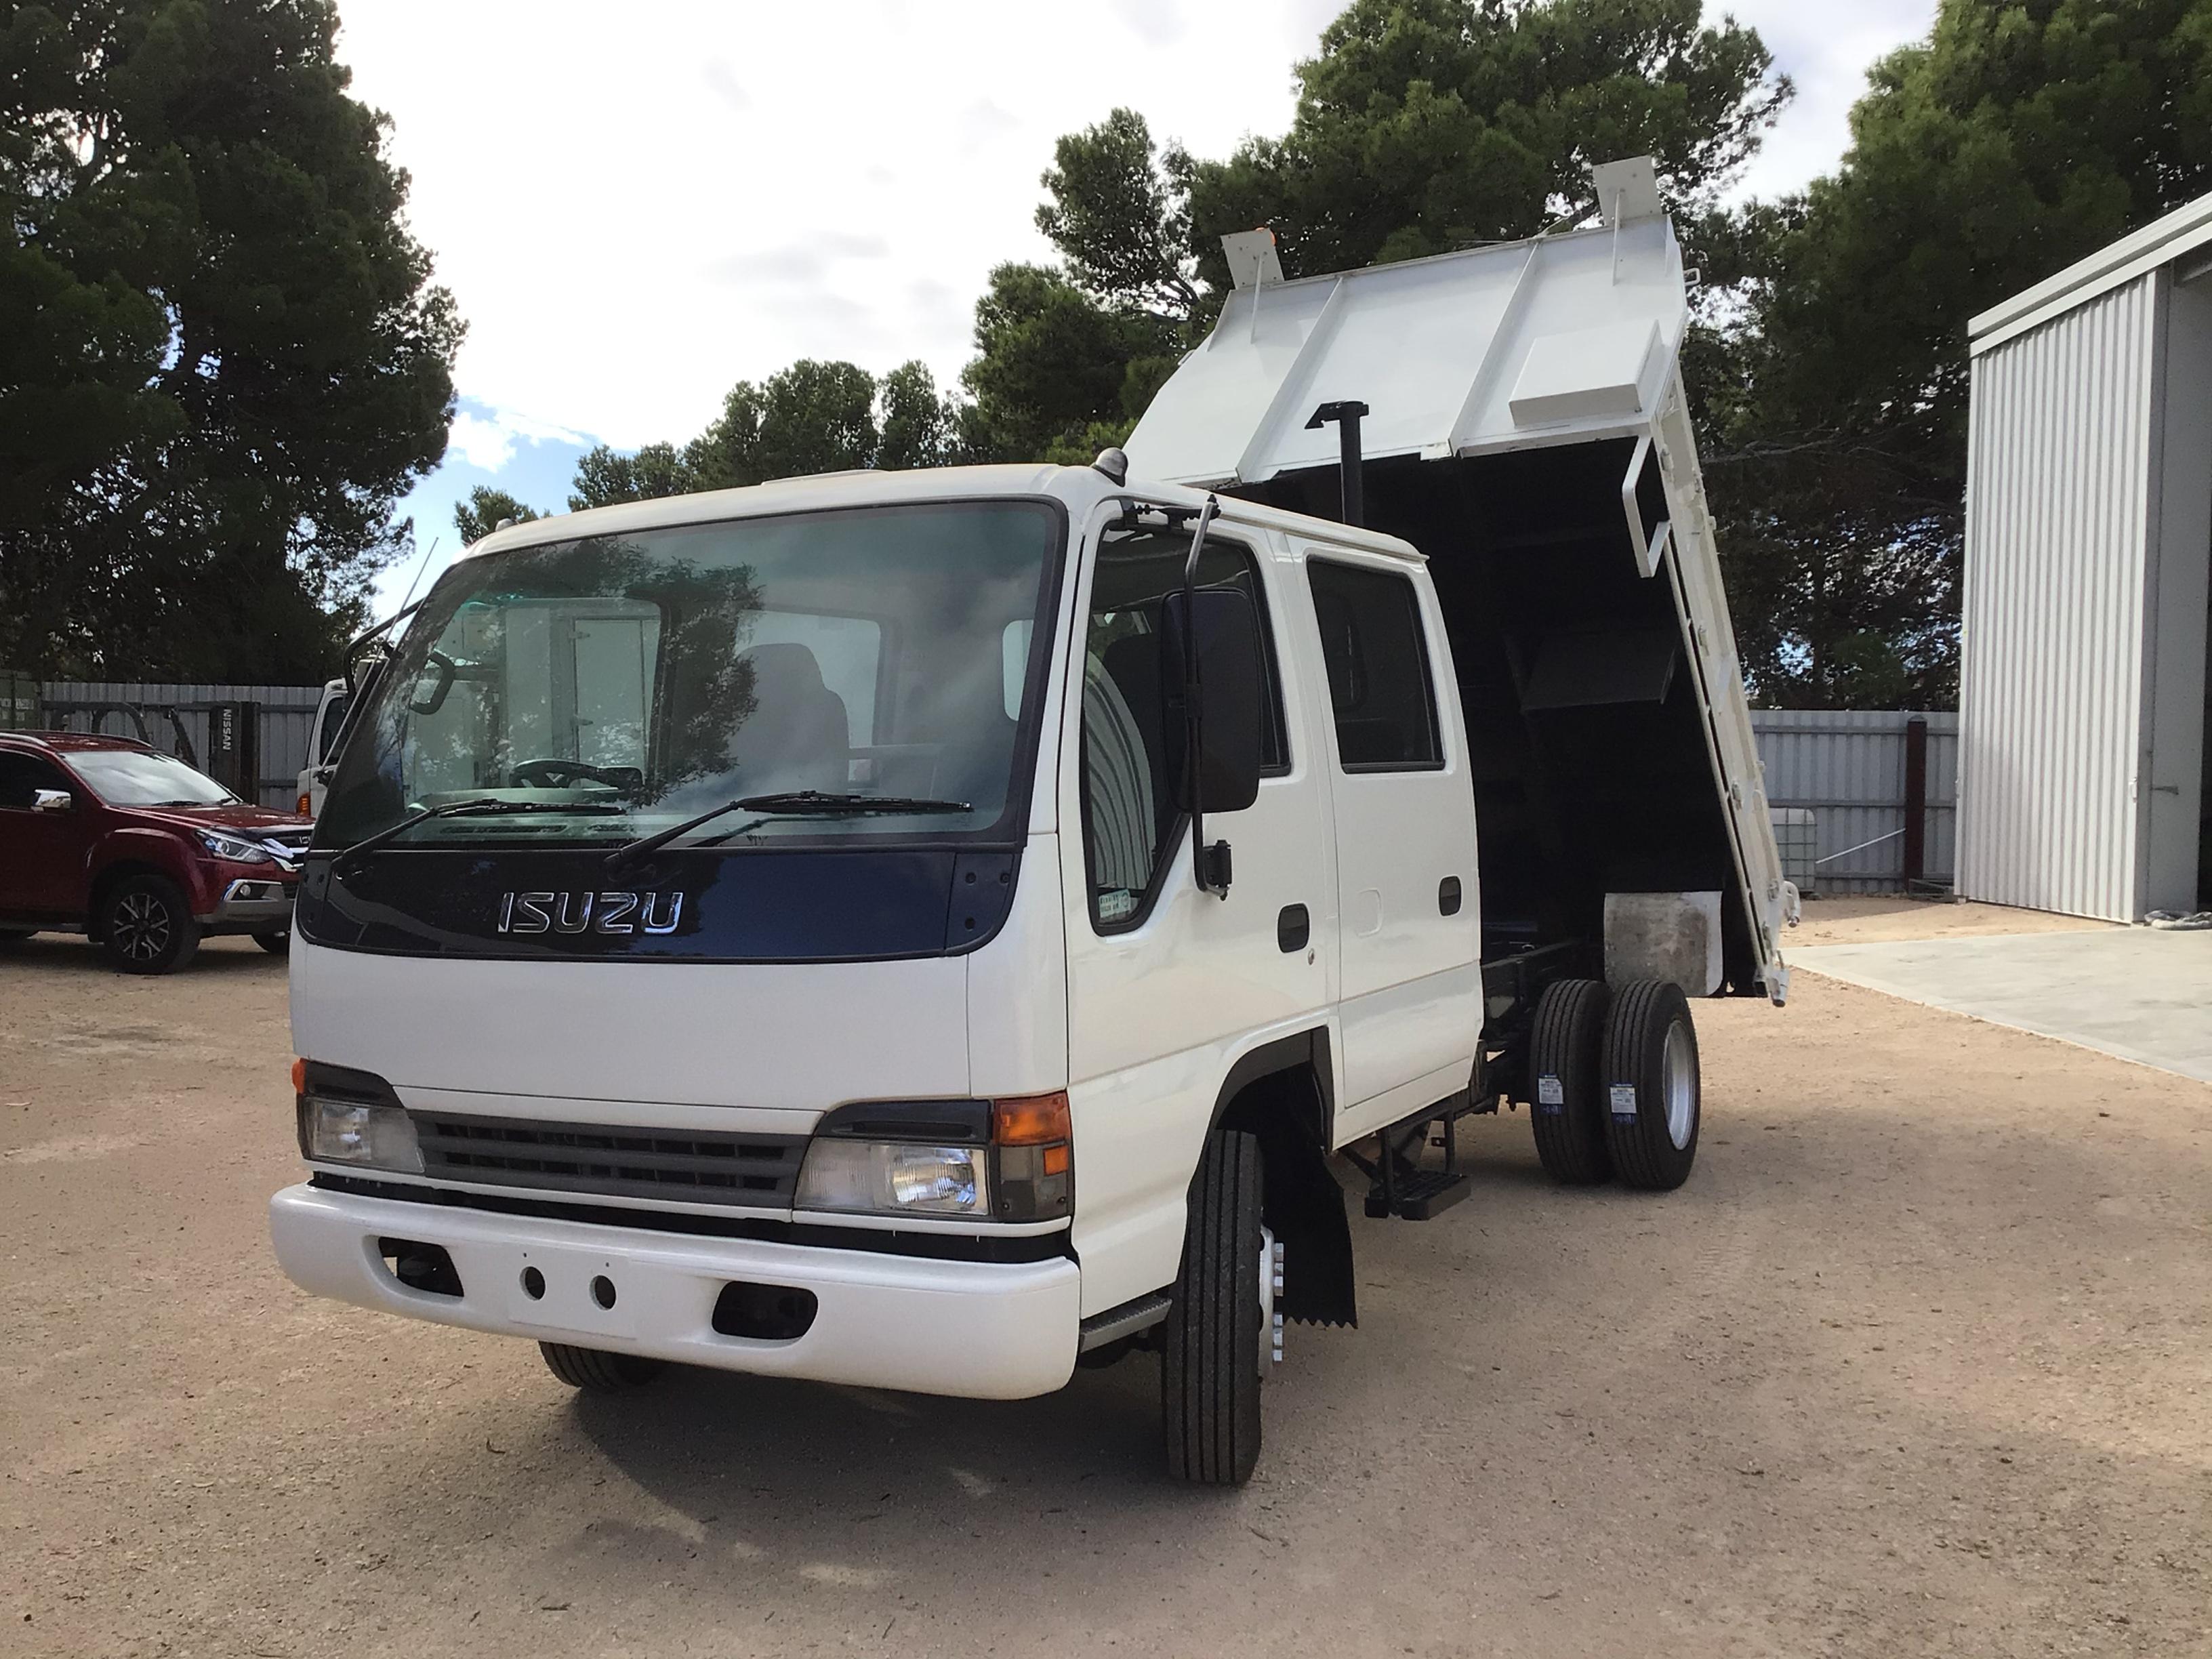 2003 Isuzu NPR400 4 x 2 Tipper Truck